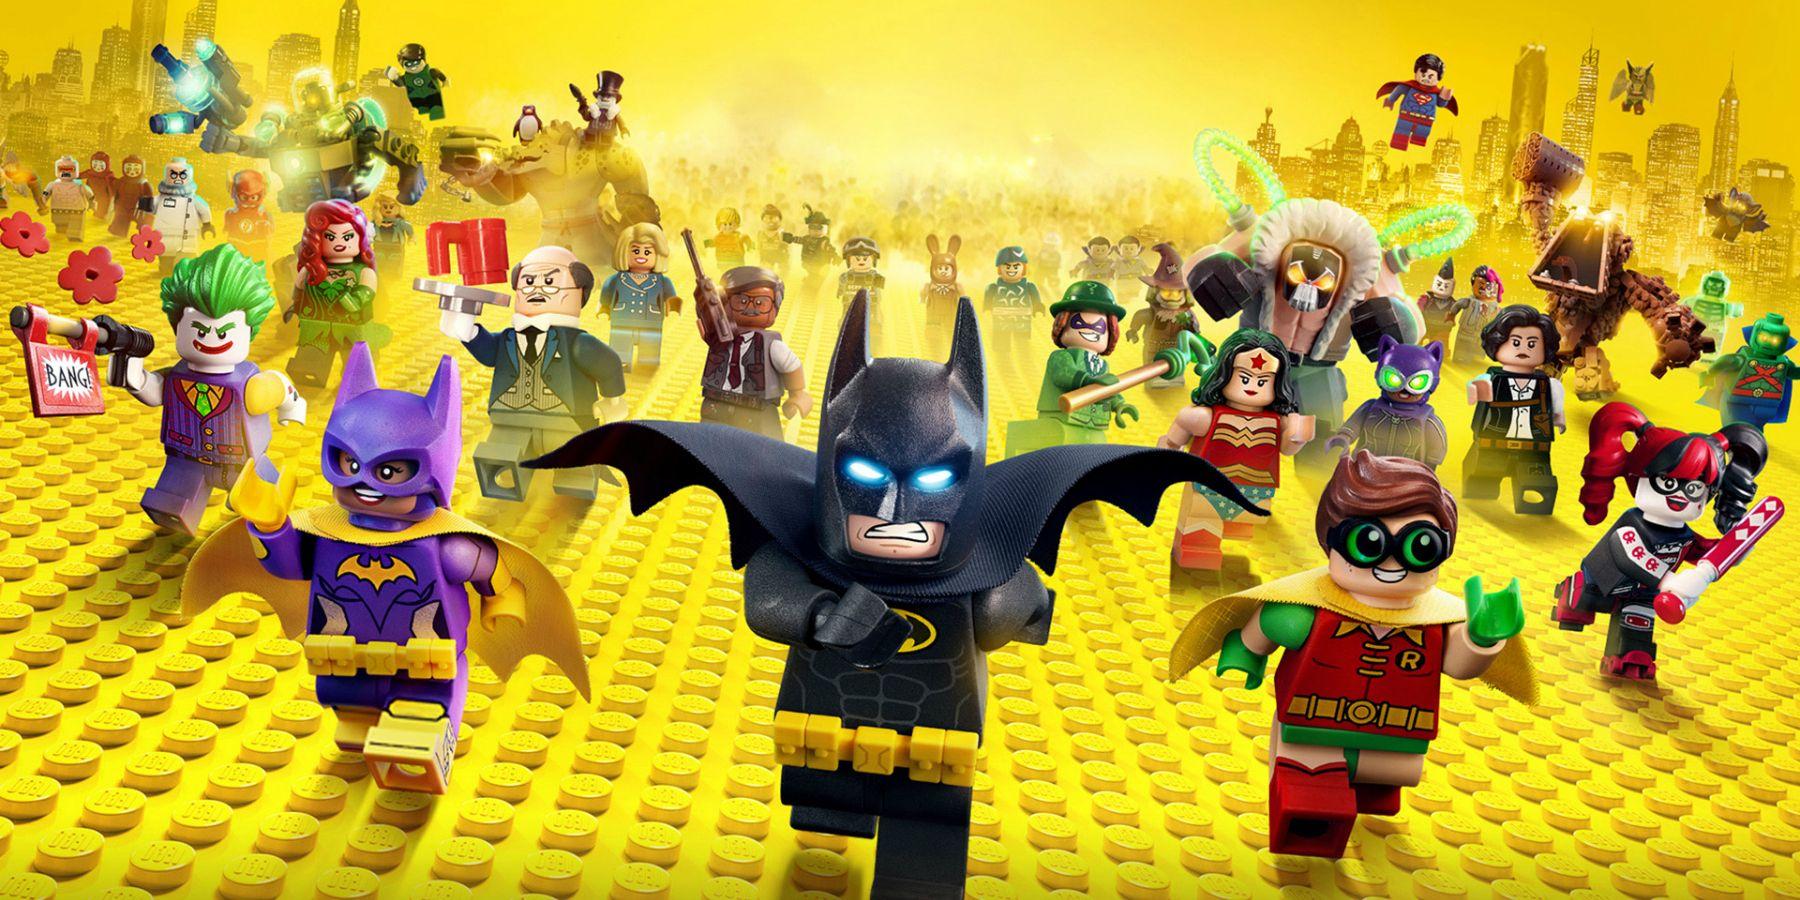 The Lego Batman Movie Wallpaper: LEGO Batman Swipes Left On DC TV Heroes In New Promo